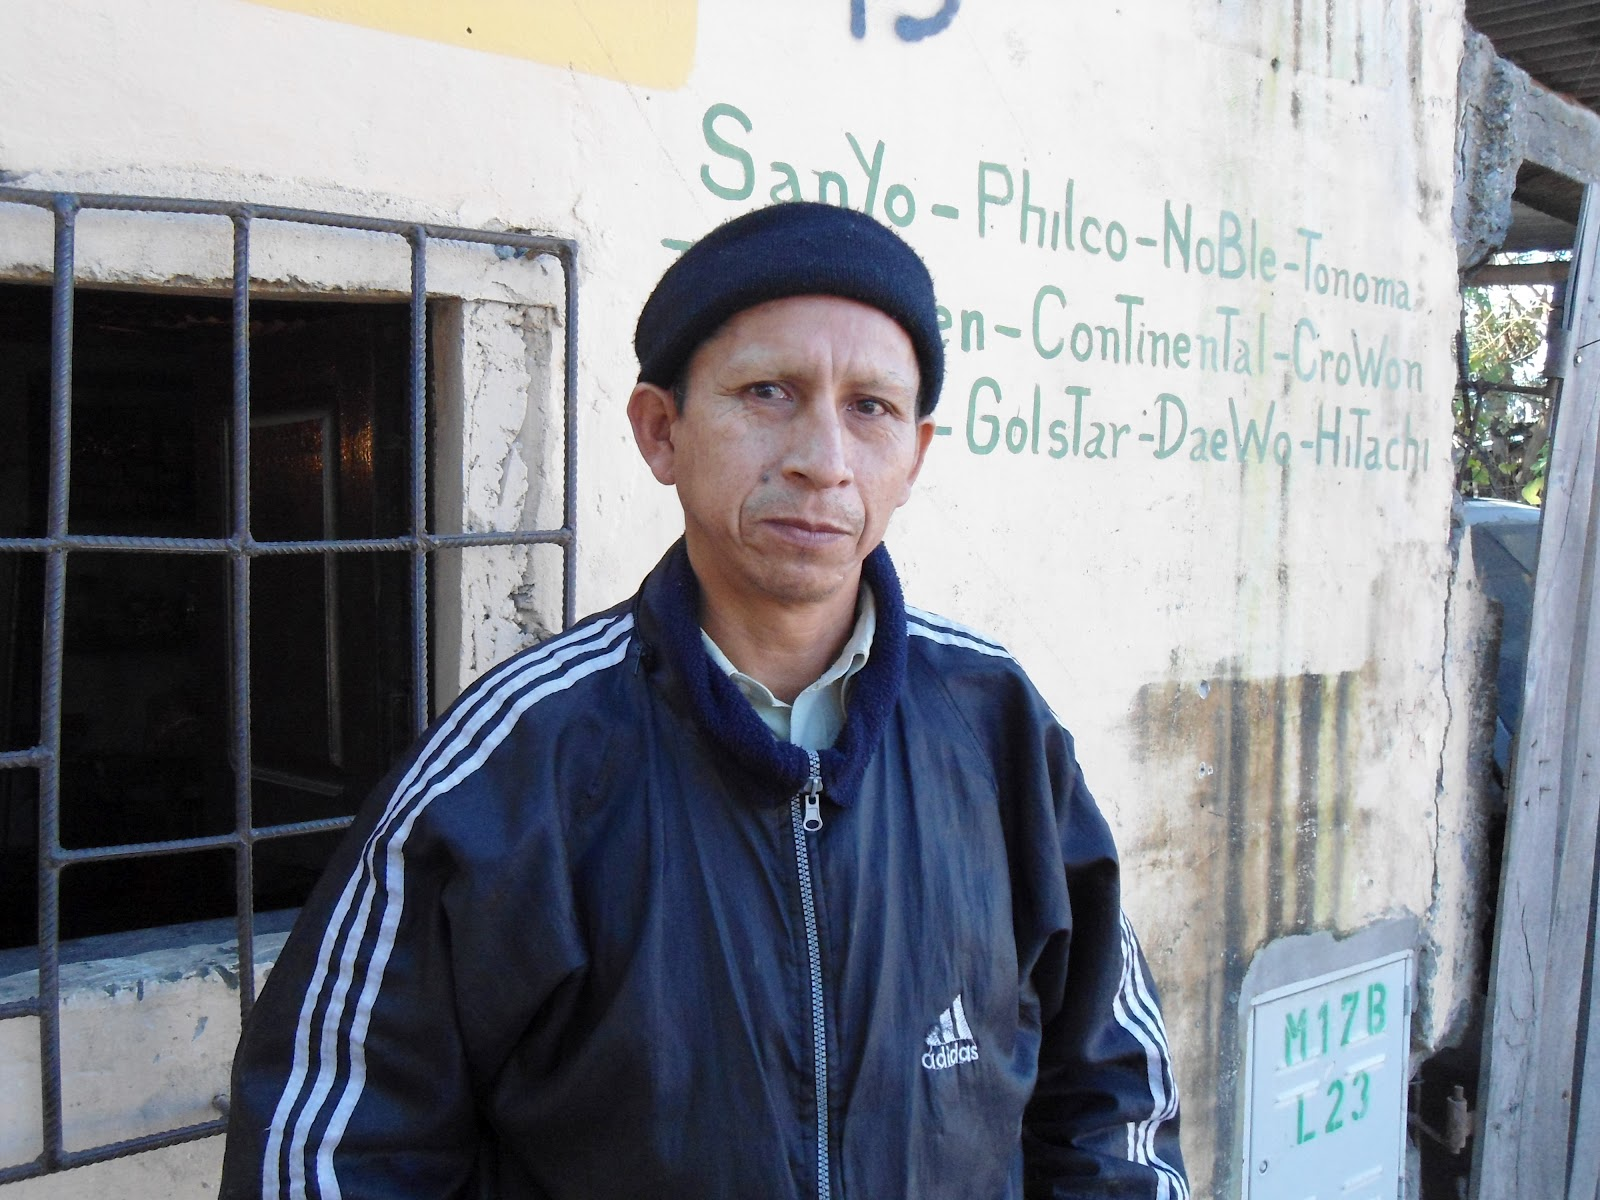 http://3.bp.blogspot.com/-8loJZIausAg/UK9oBRa4yII/AAAAAAAAPRI/7AR5XDMd5GU/s1600/Jose+Armella+(1).JPG